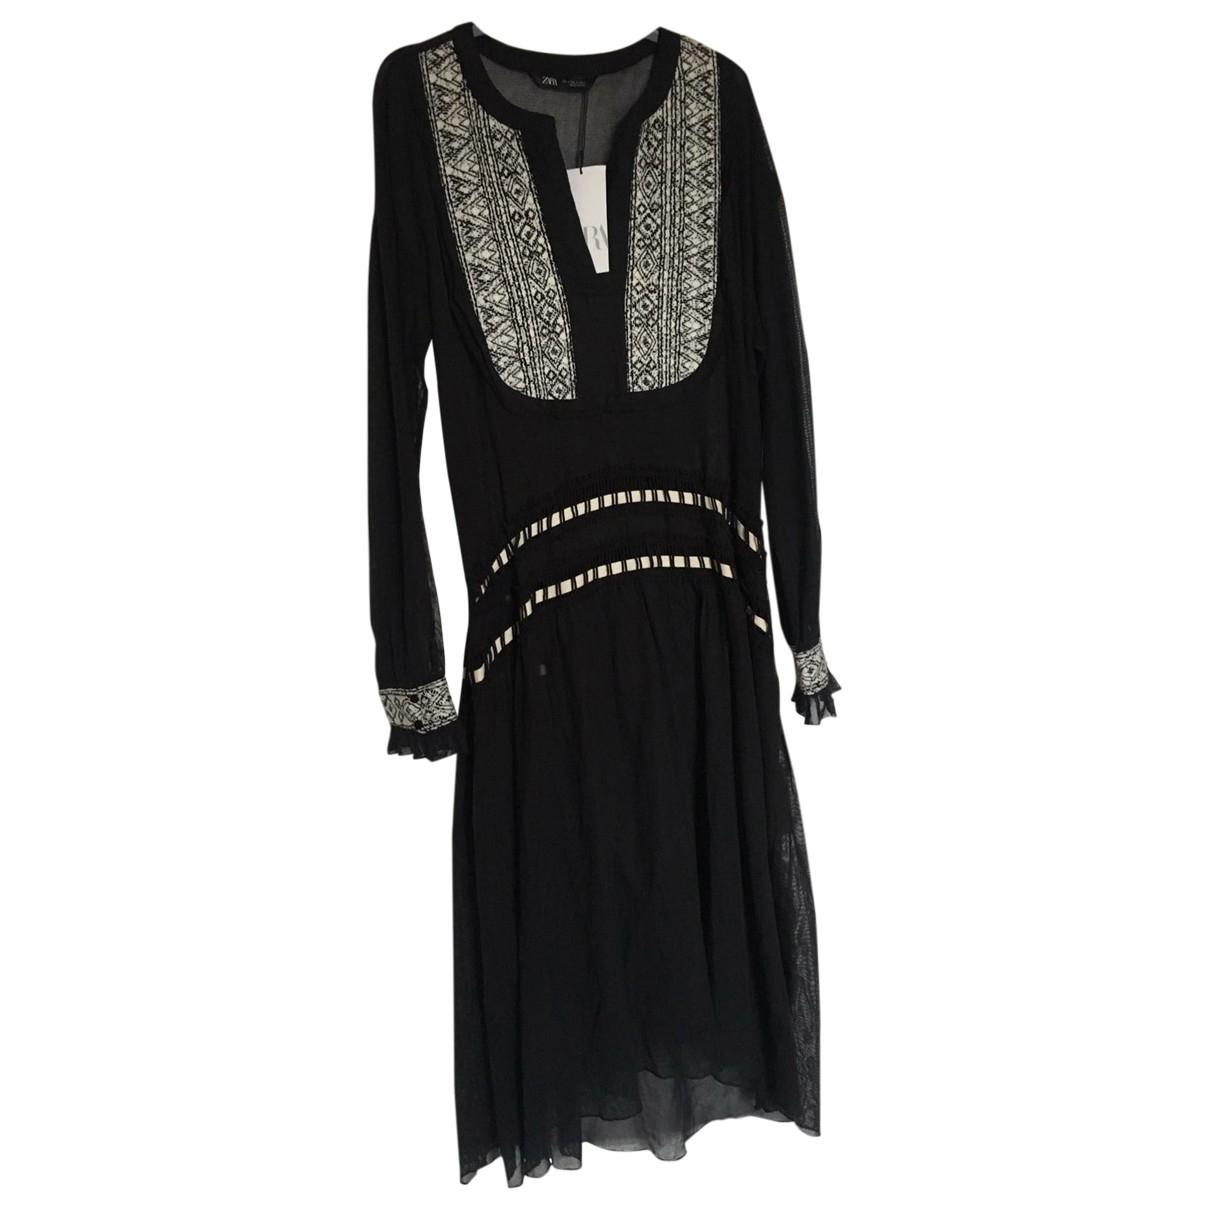 Zara \N Black Cotton dress for Women S International